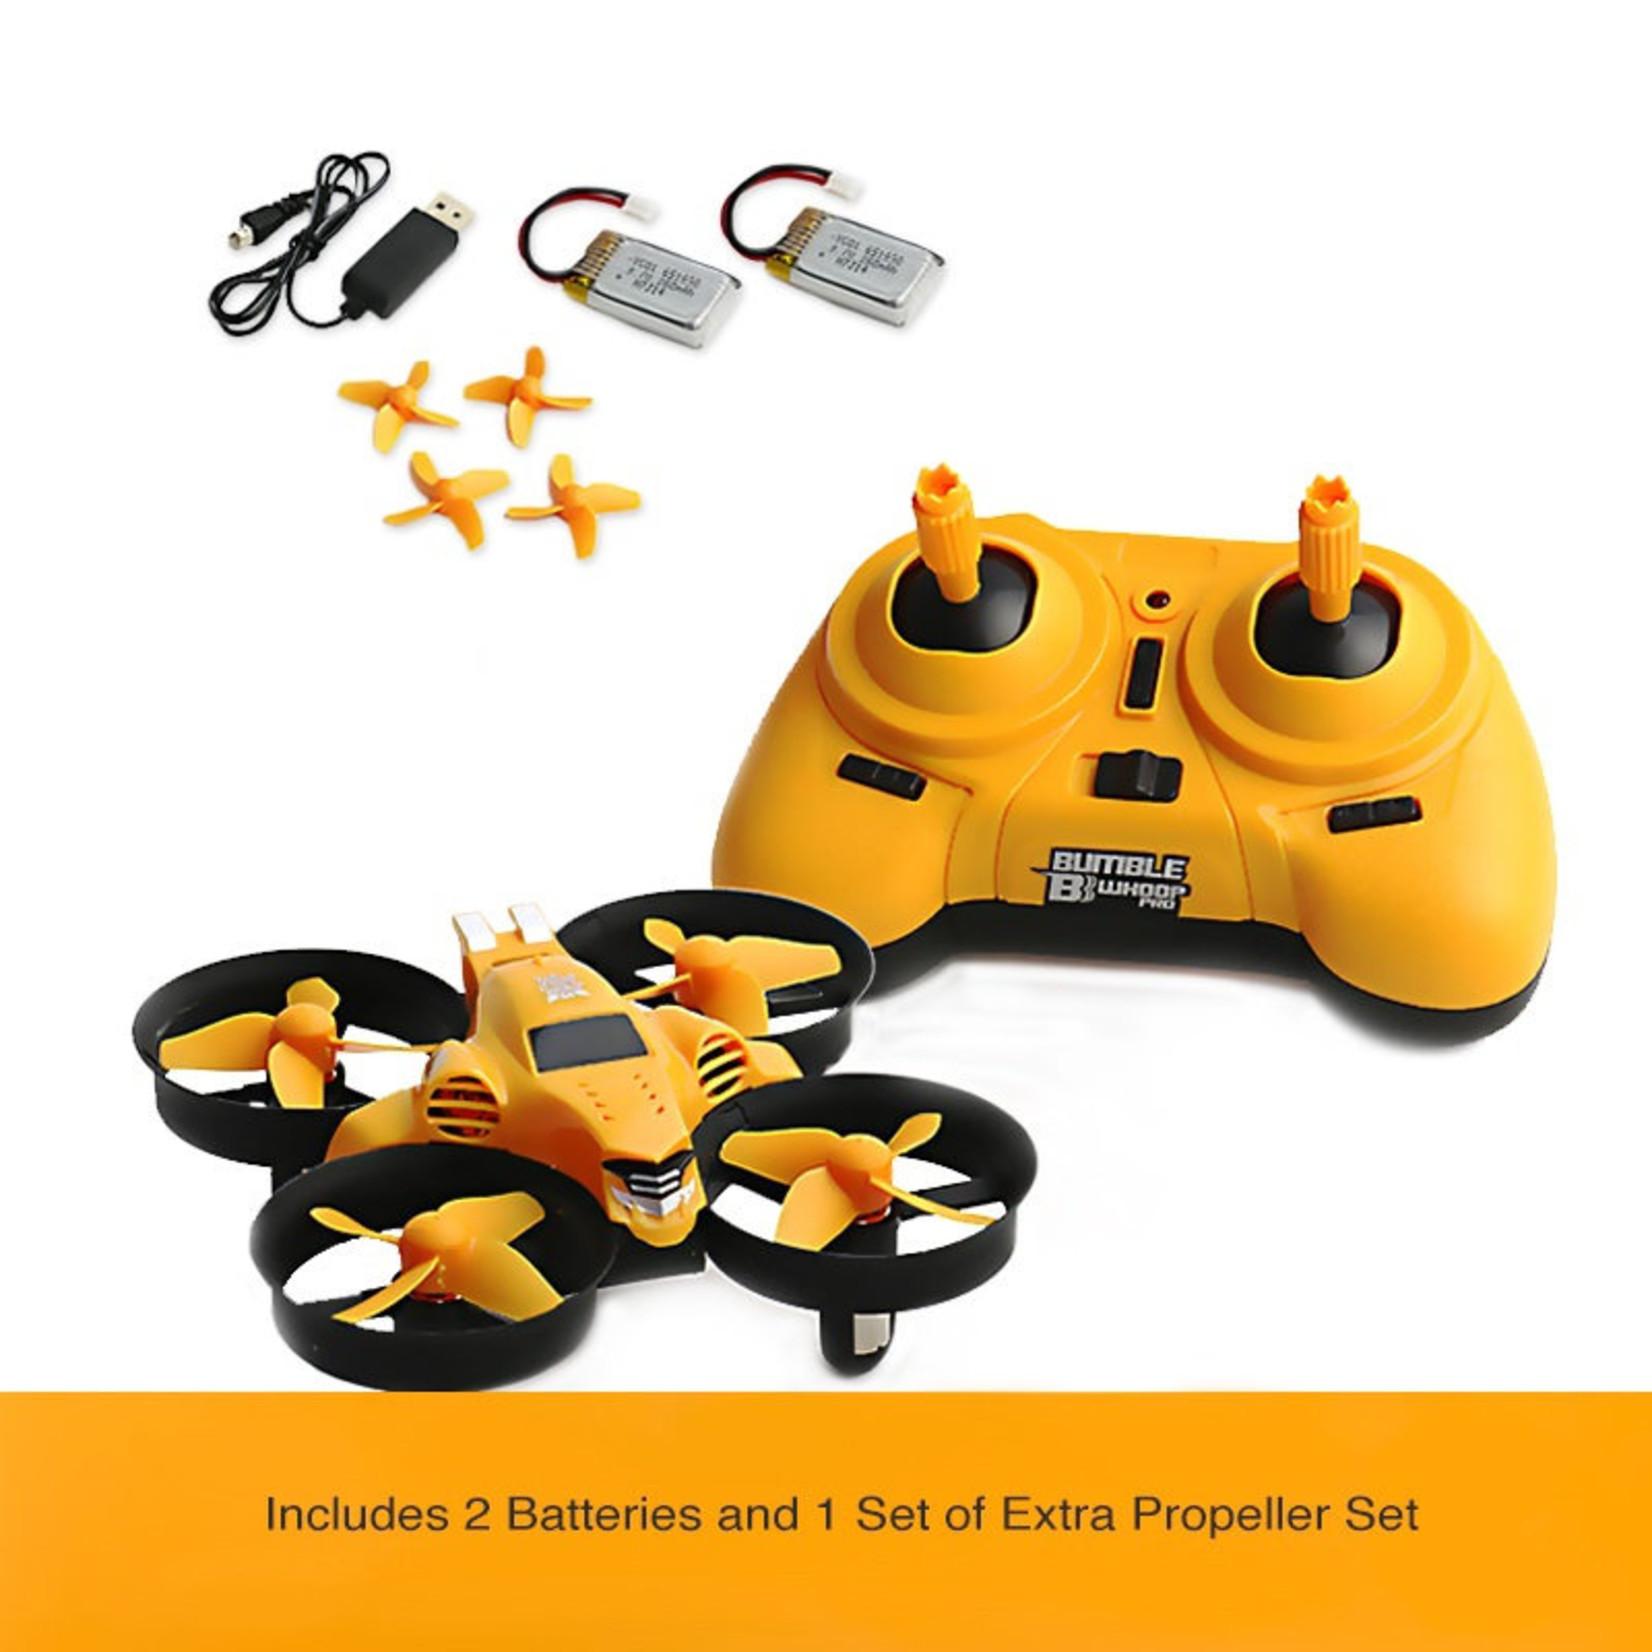 Iron Quad IQ-BB-WP Iron Quad BumbleB Whoop Pro Drone Set